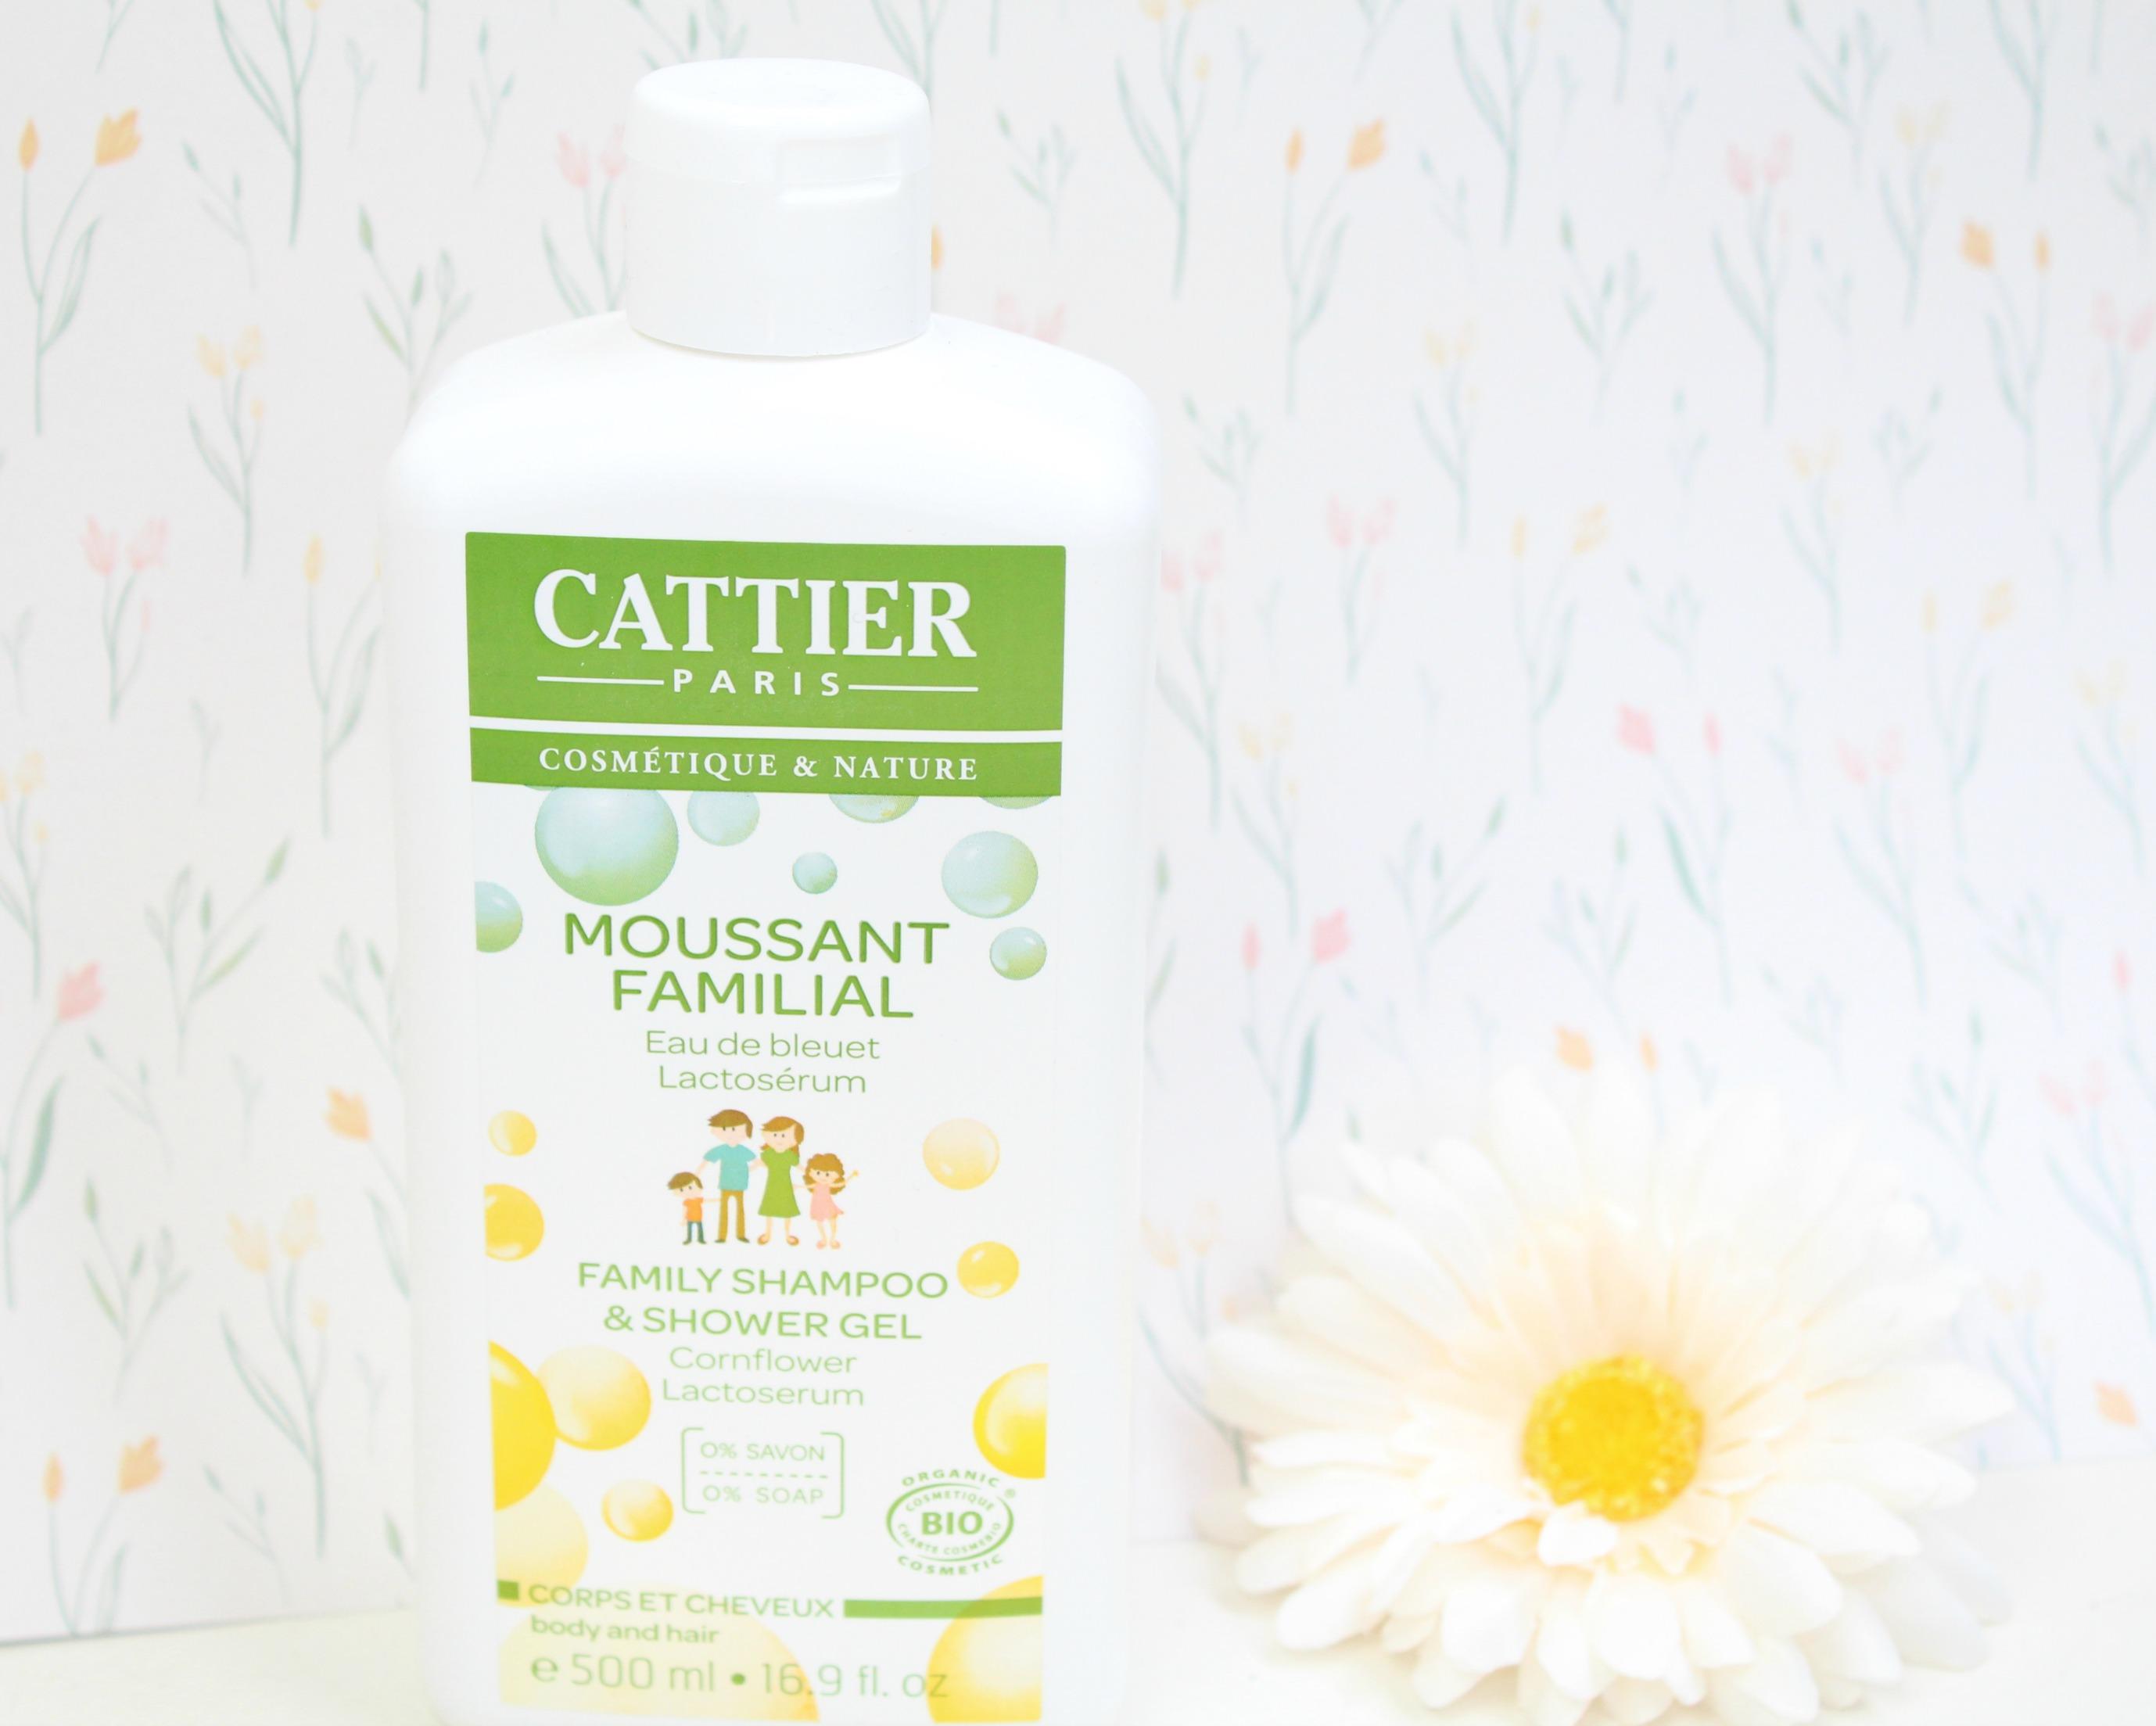 Review Cattier Paris family shampoo & shower gel_GoodGirlsCompany